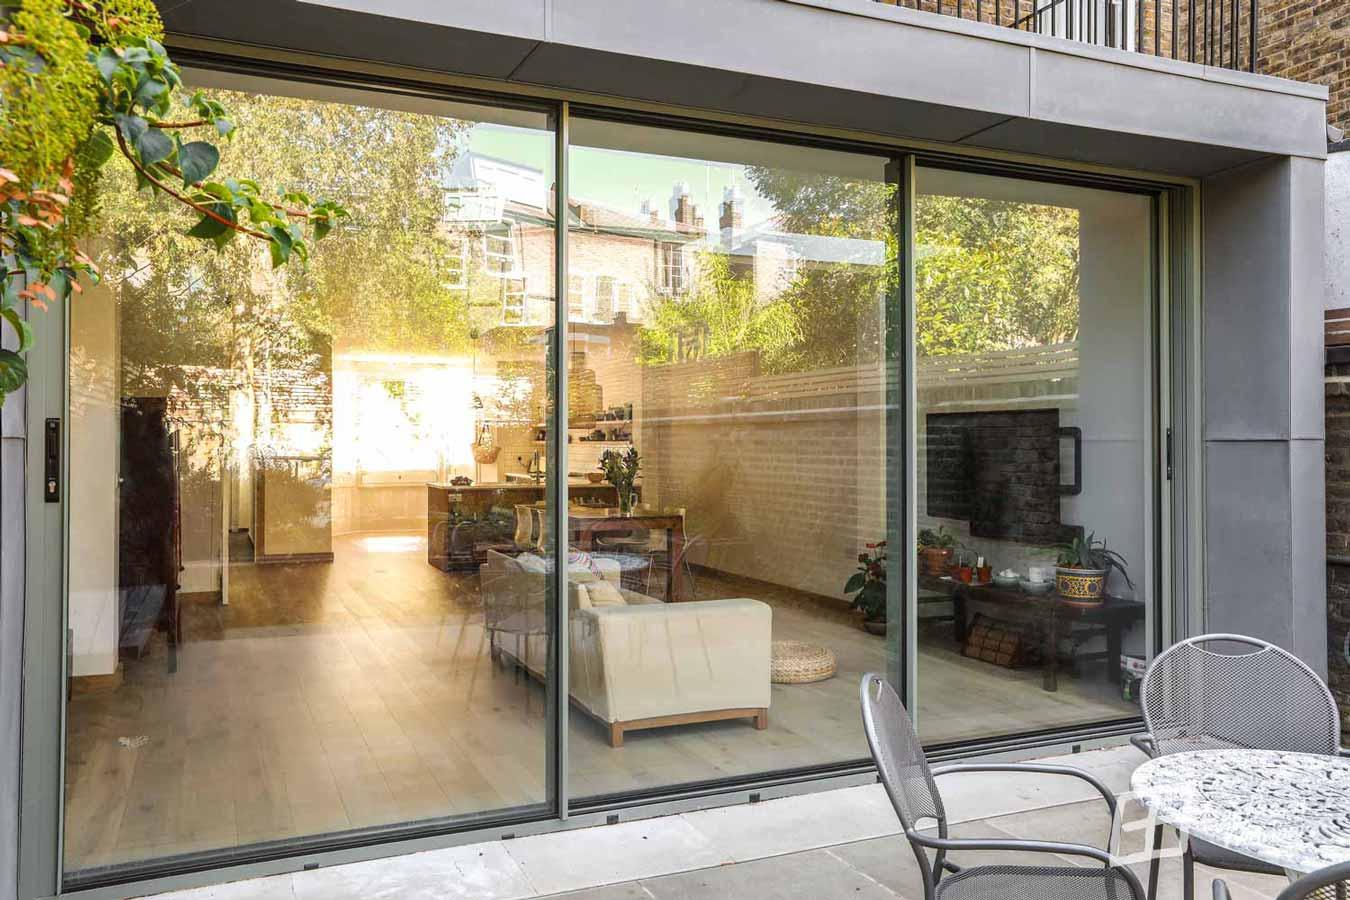 House extension with CorVision Aluminium Slim Sliding Doors installed